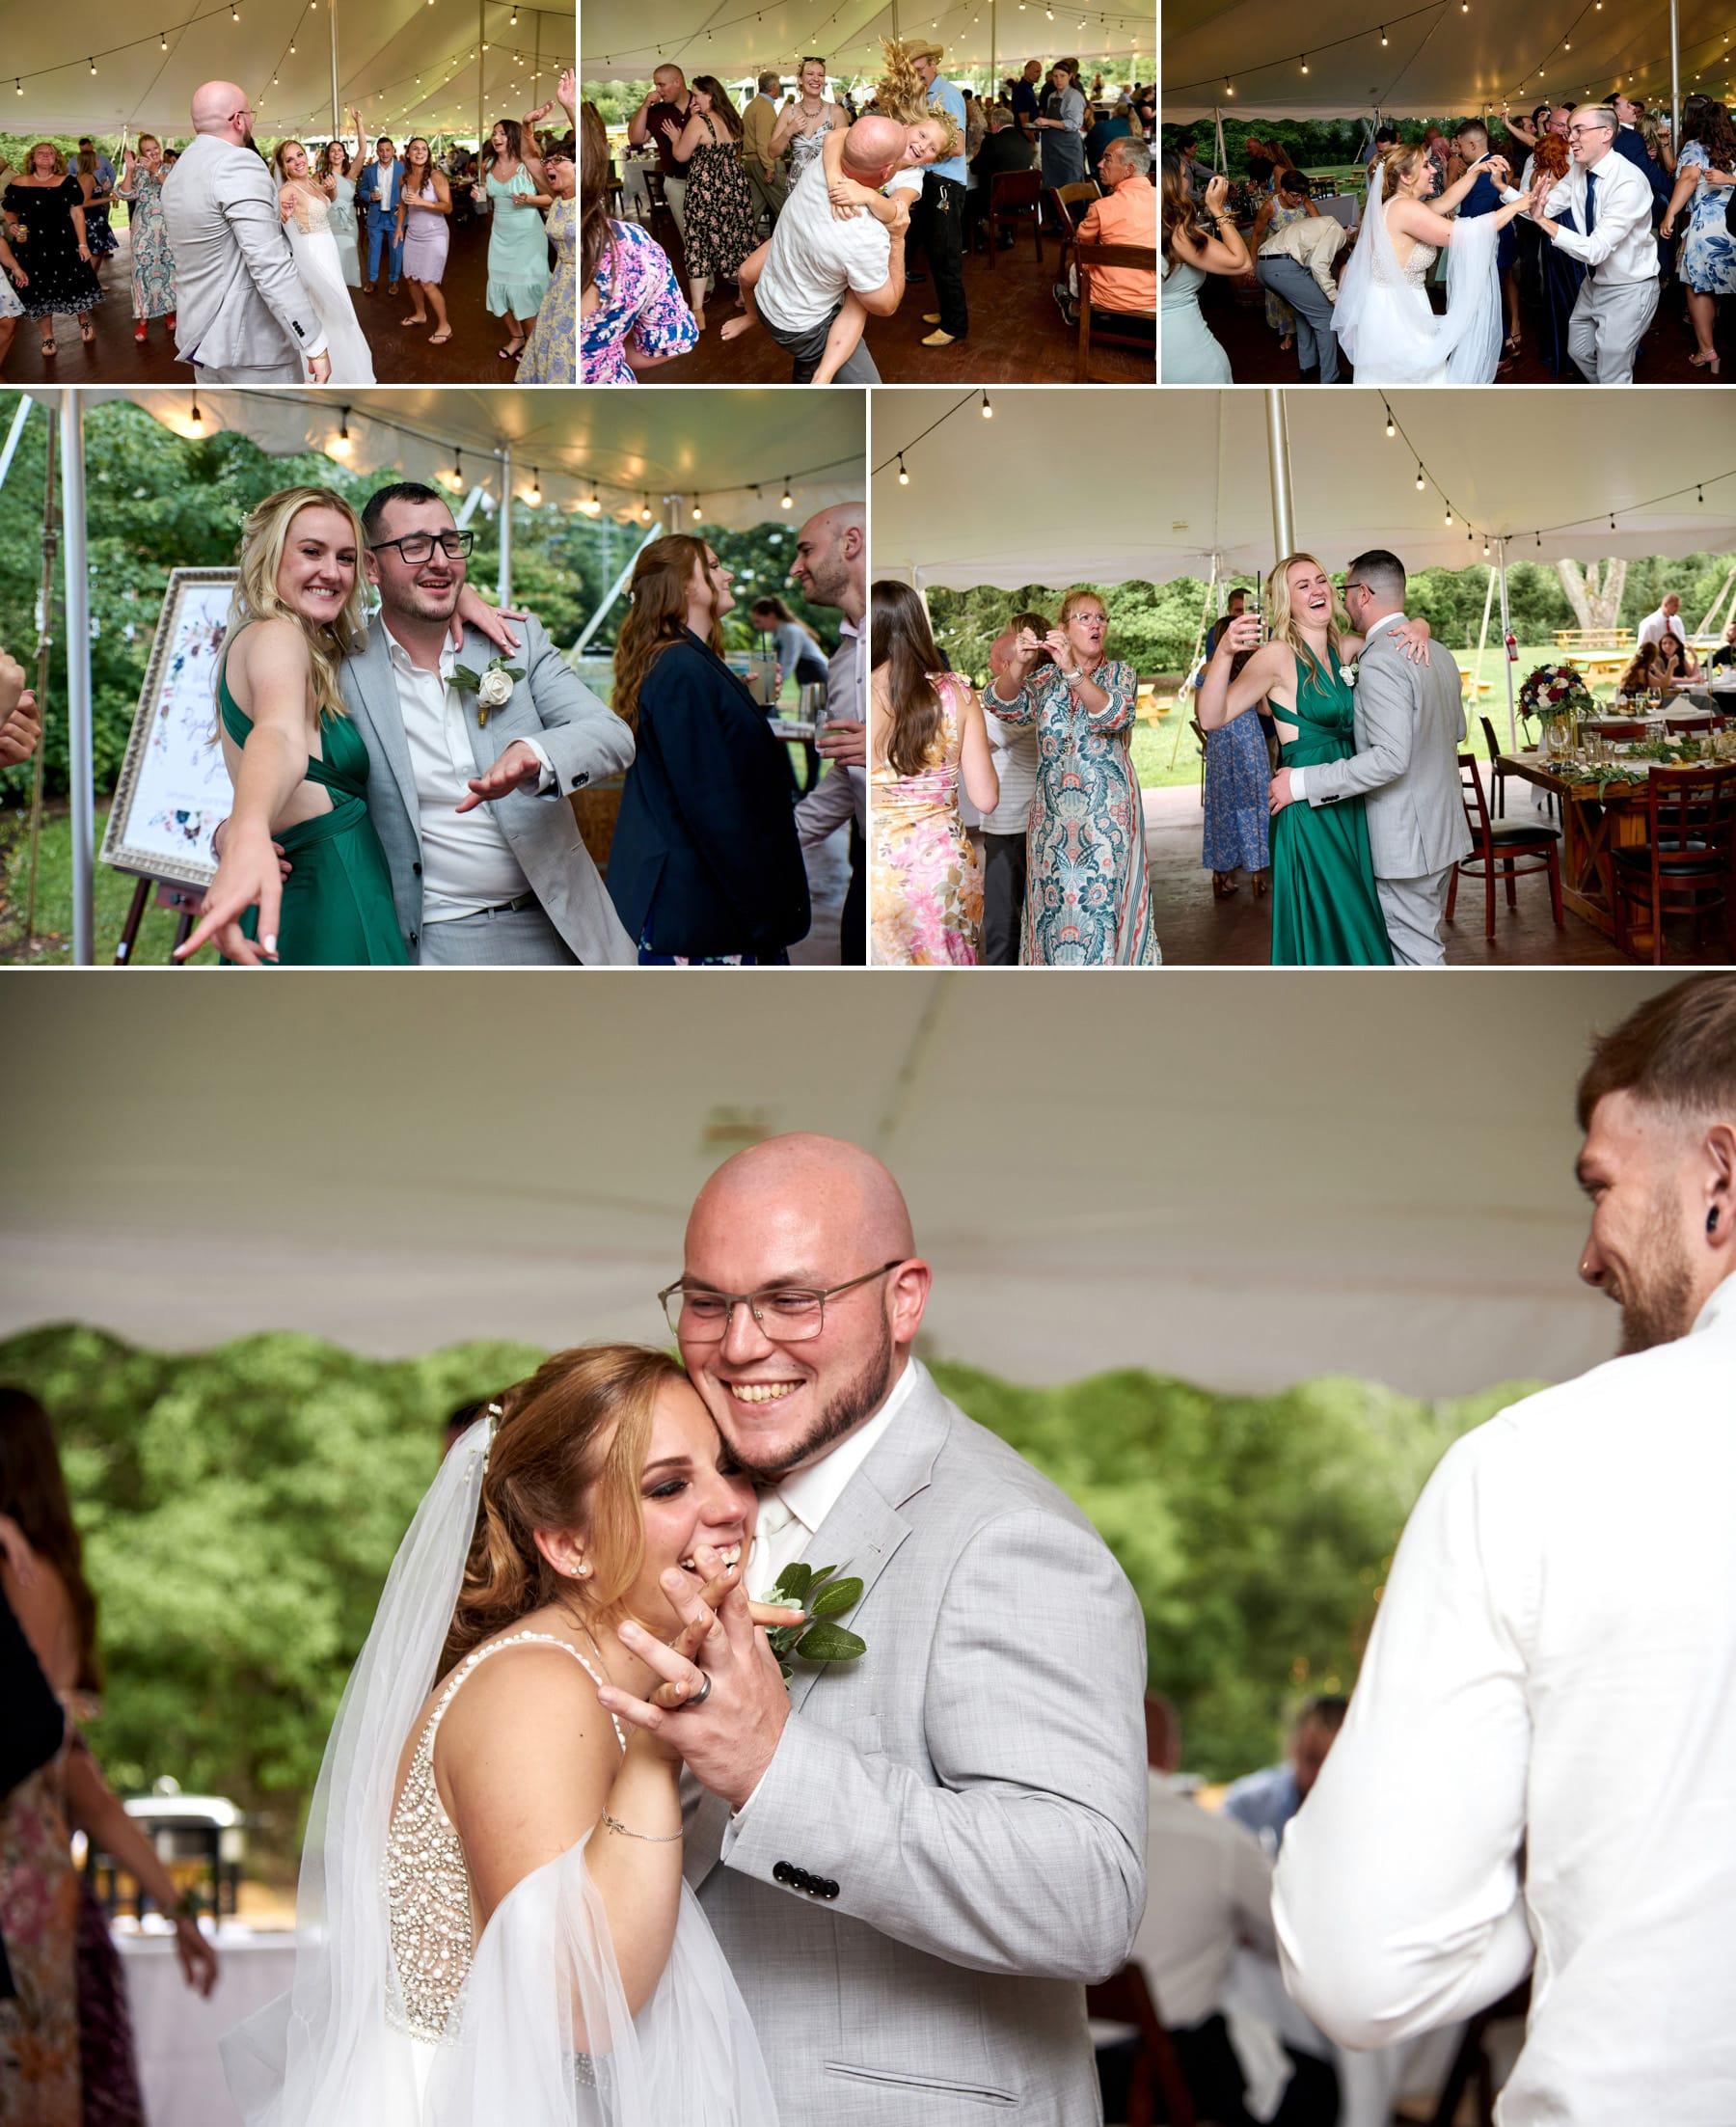 Brick Farm Tavern wedding reception photos